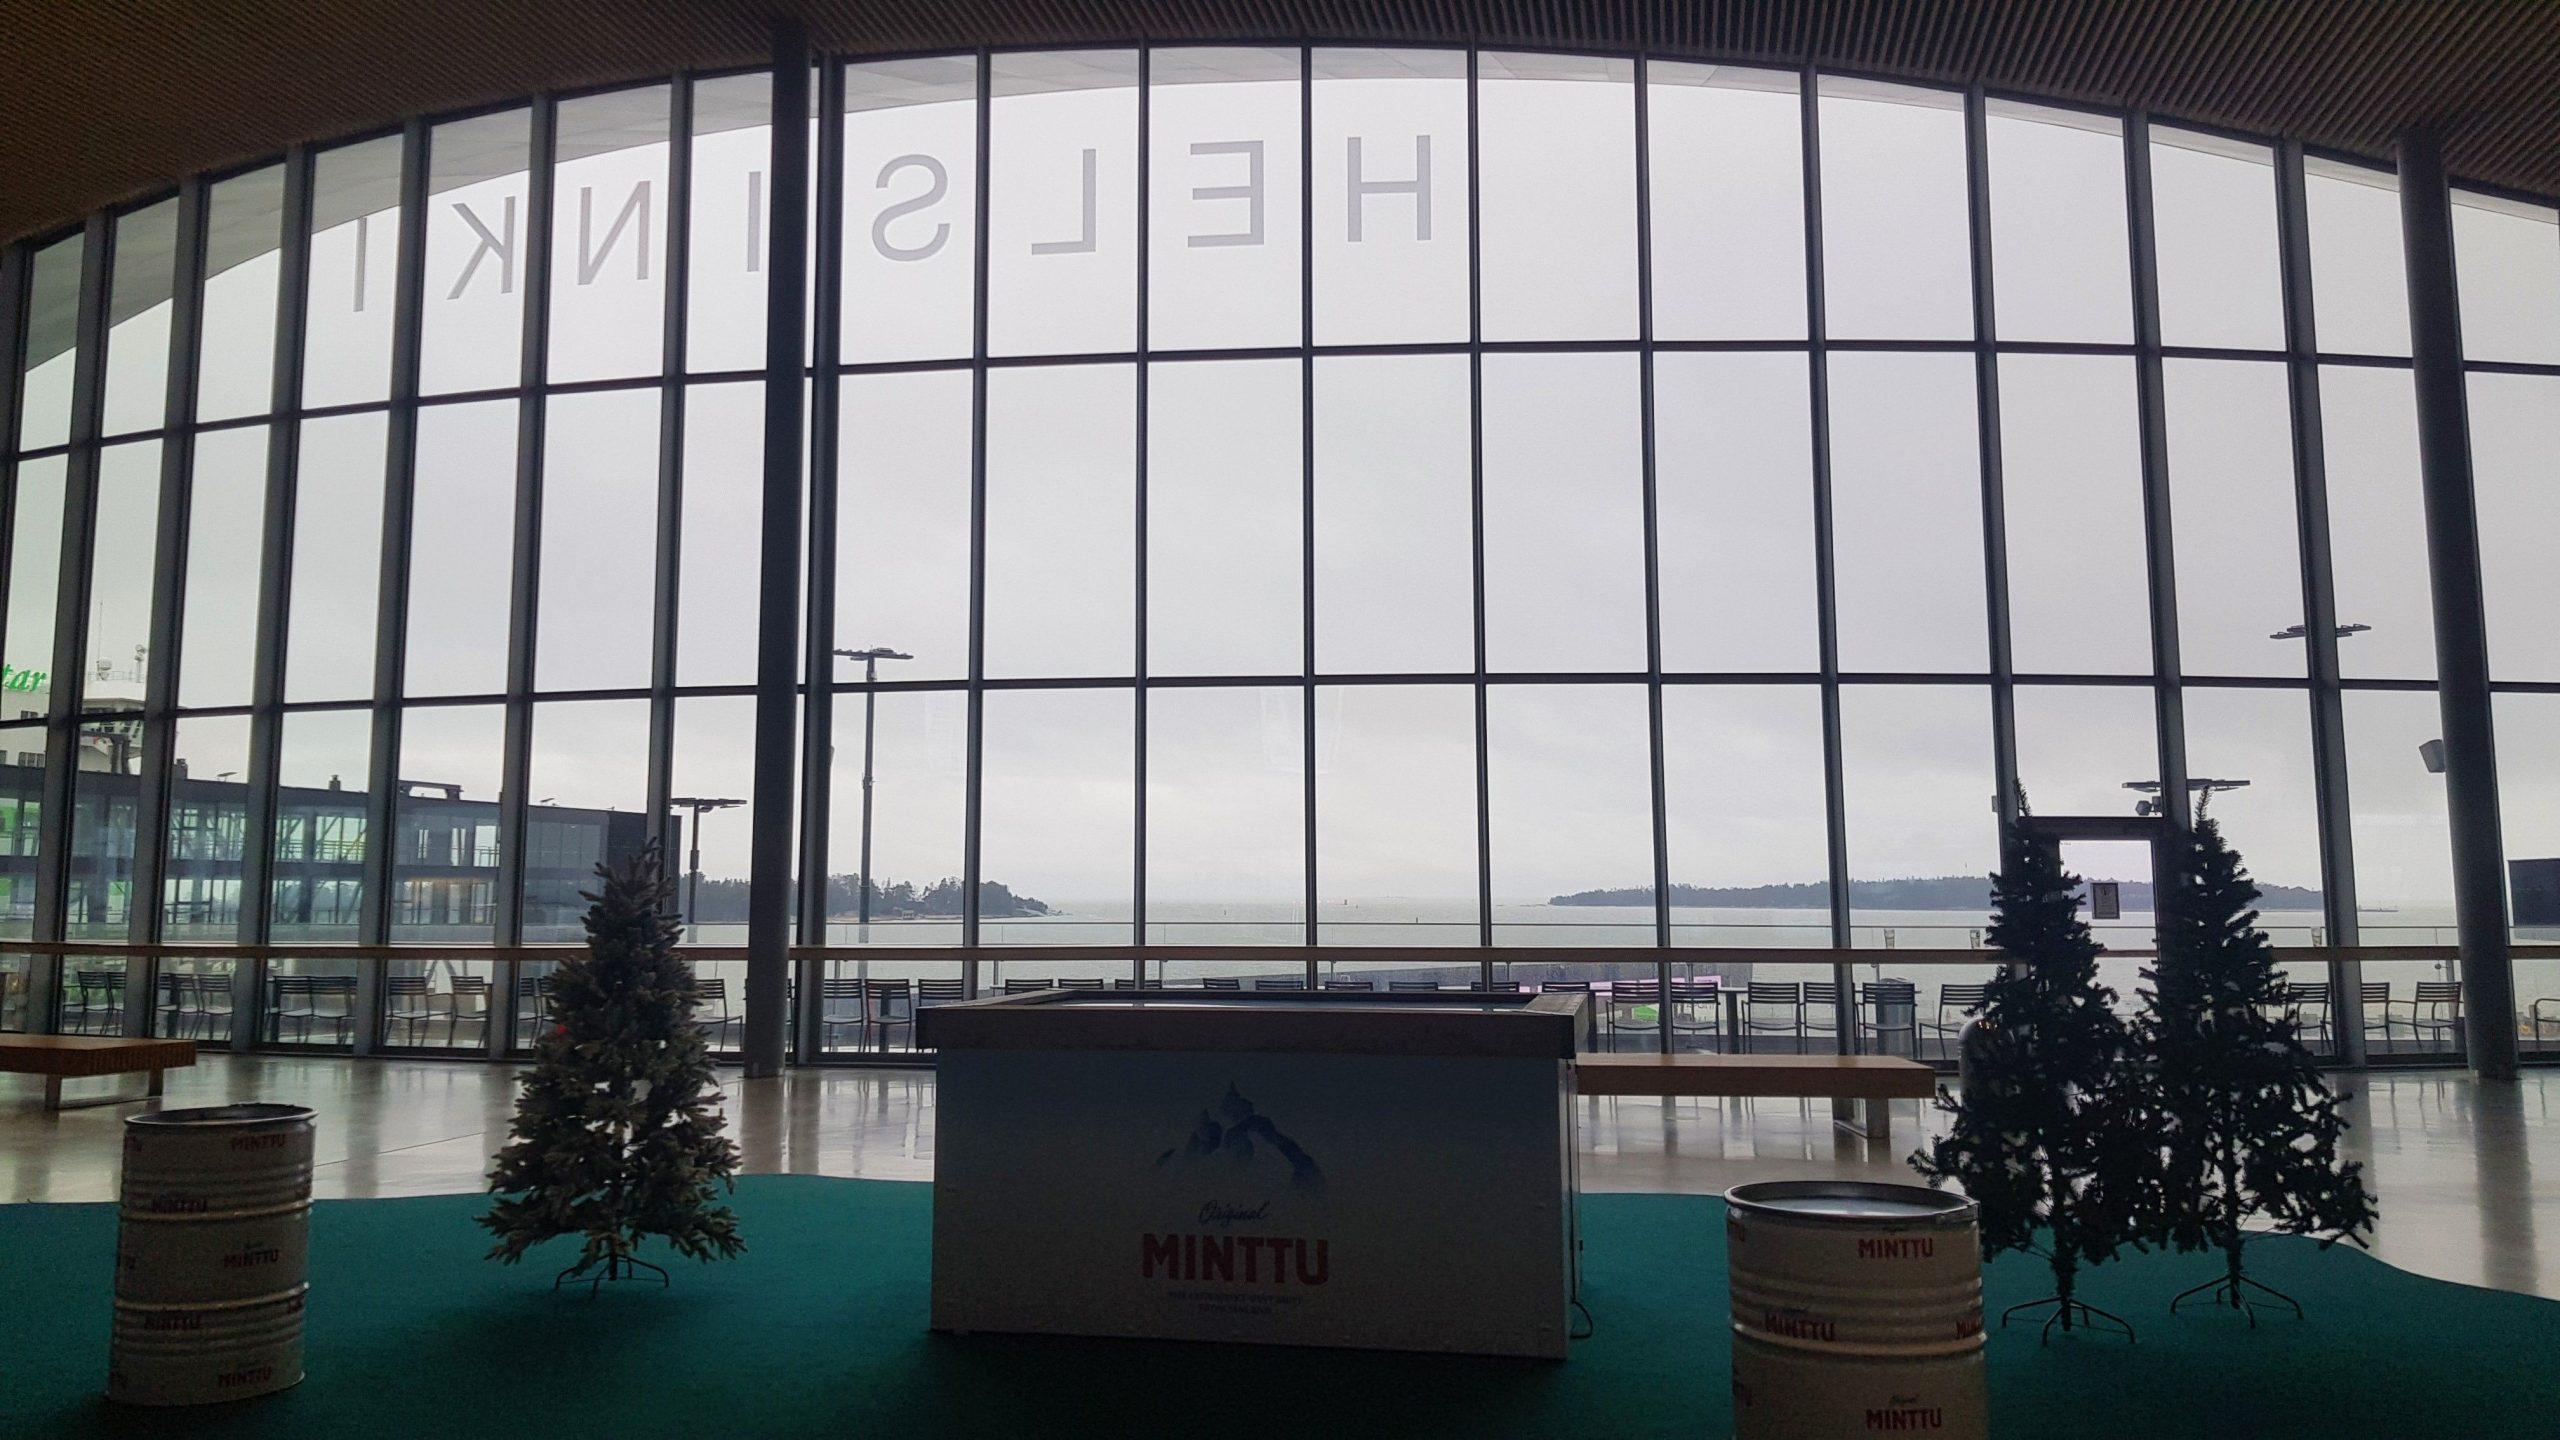 Fachada acristalada de la terminal de ferrys de helsinki.